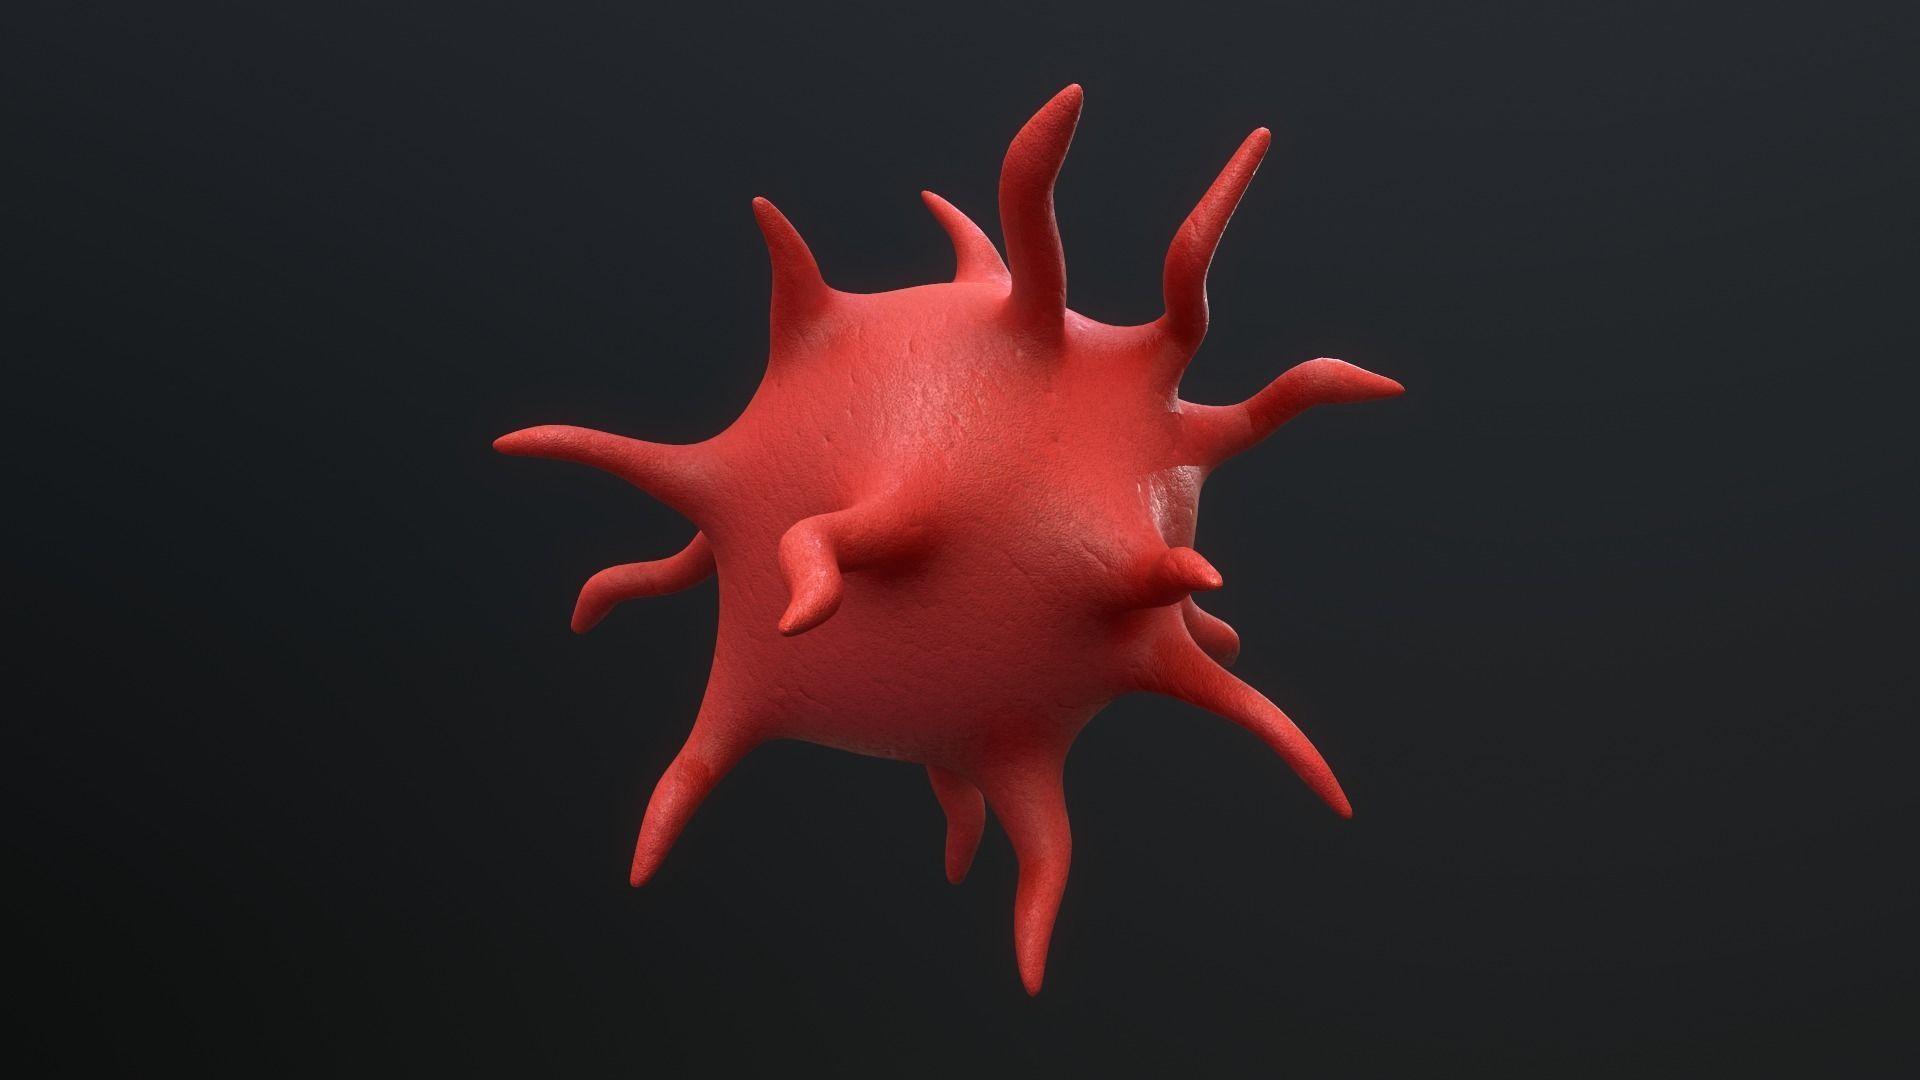 Platelet Thrombocyte